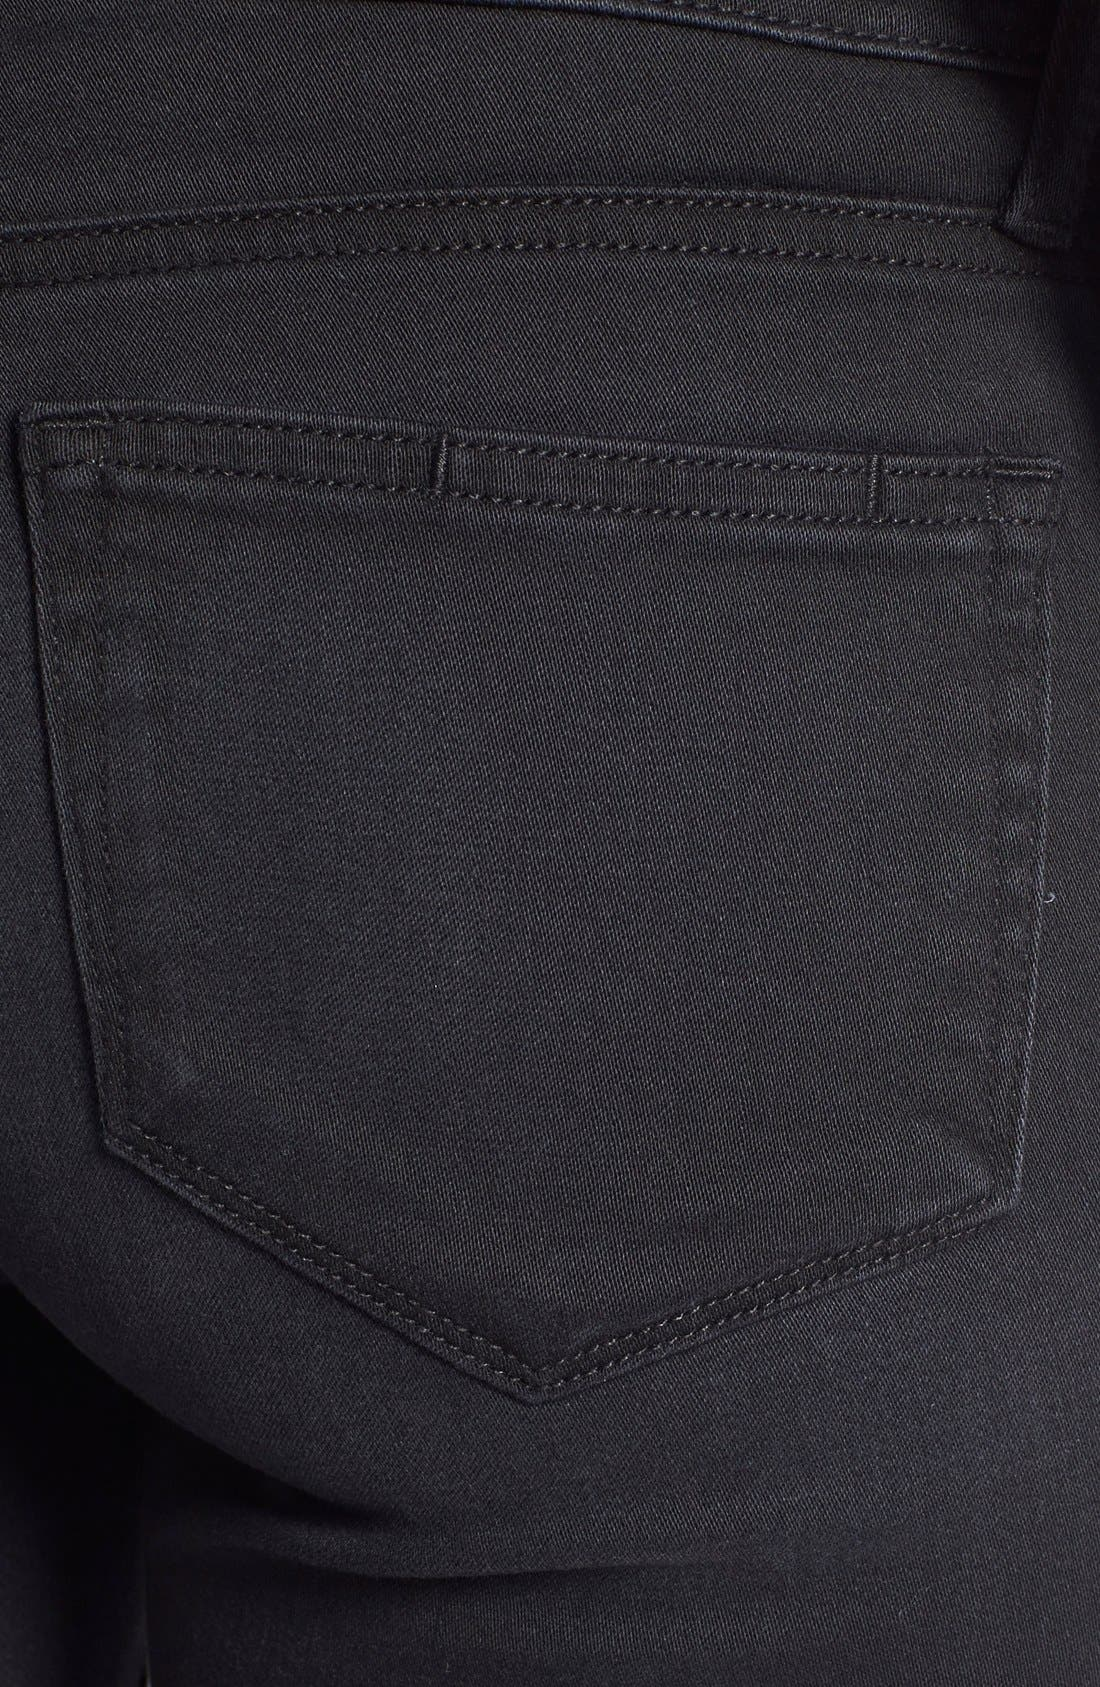 Alternate Image 3  - Paige Denim 'Verdugo' Ultra Skinny Jeans (Cleo Embellished)